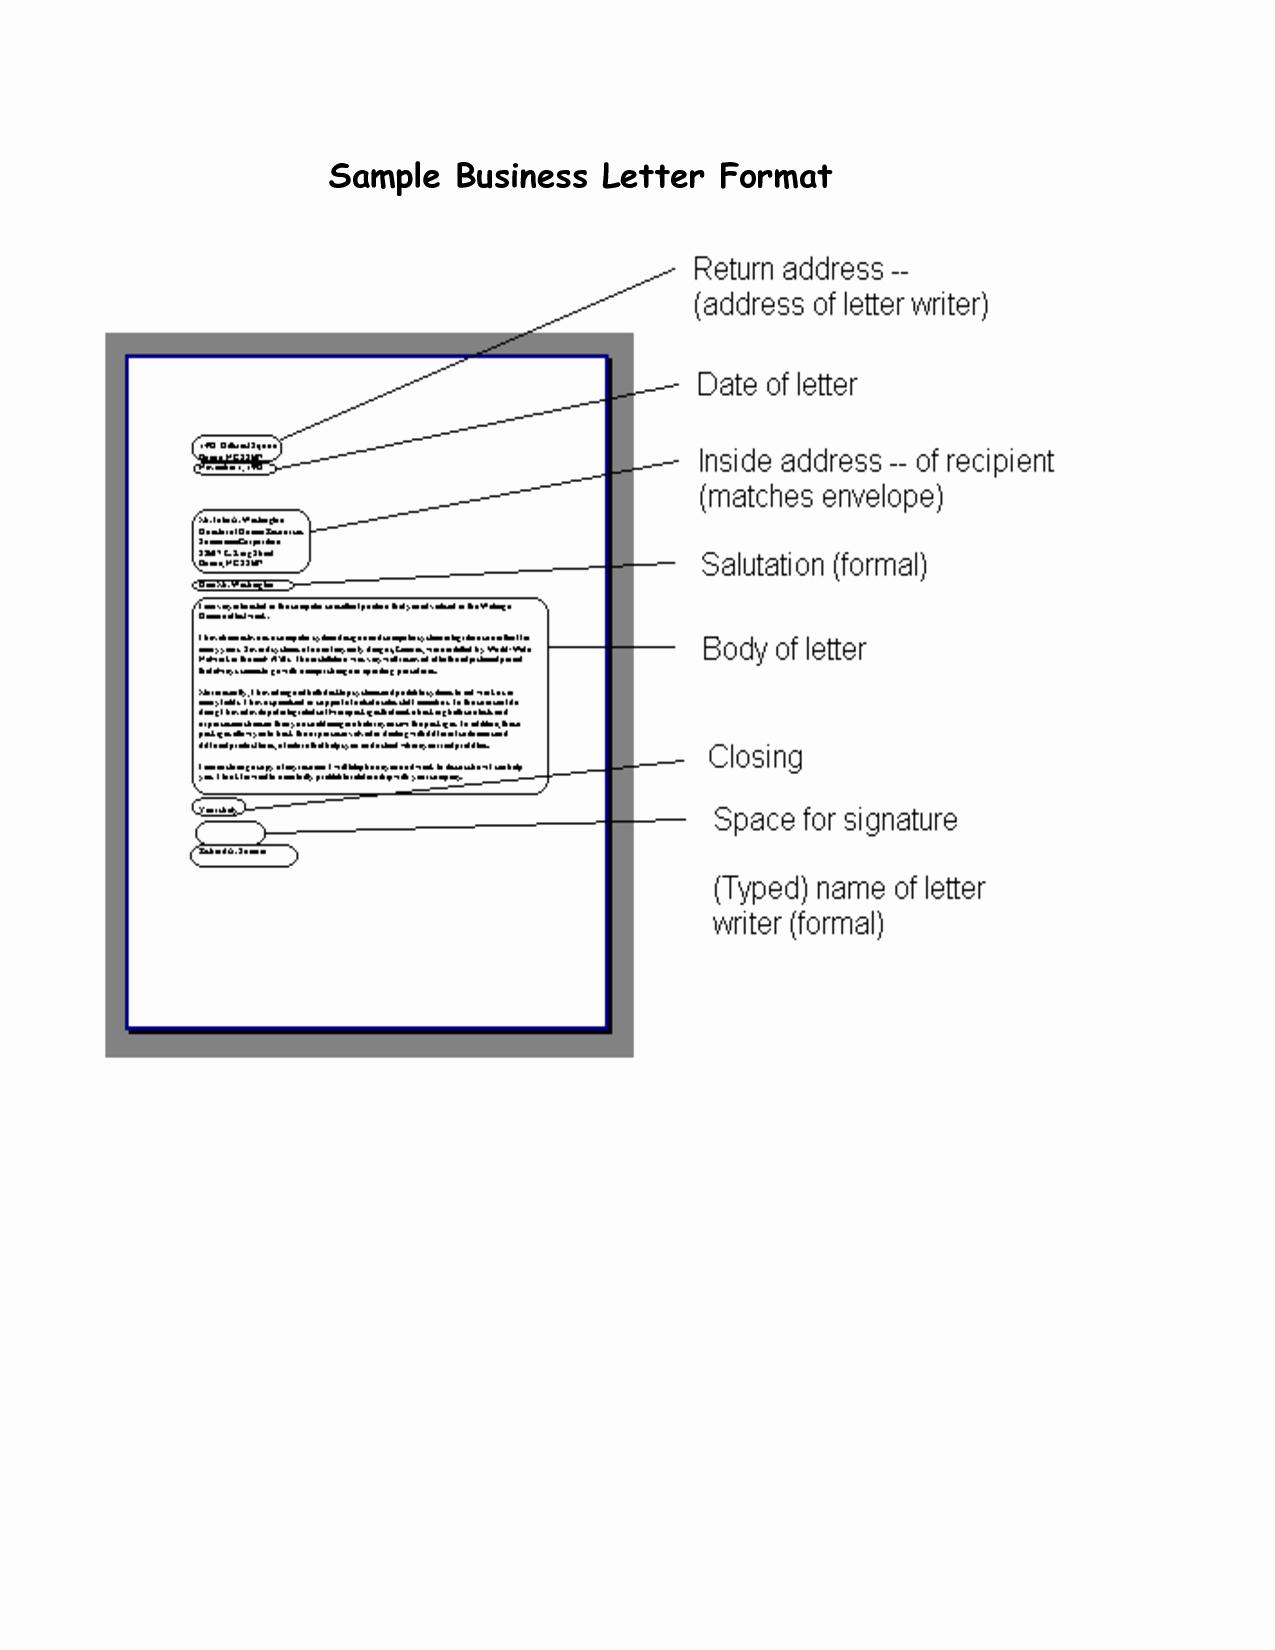 Formal Letter format Sample Fresh Free Printable Business Letter Template form Generic